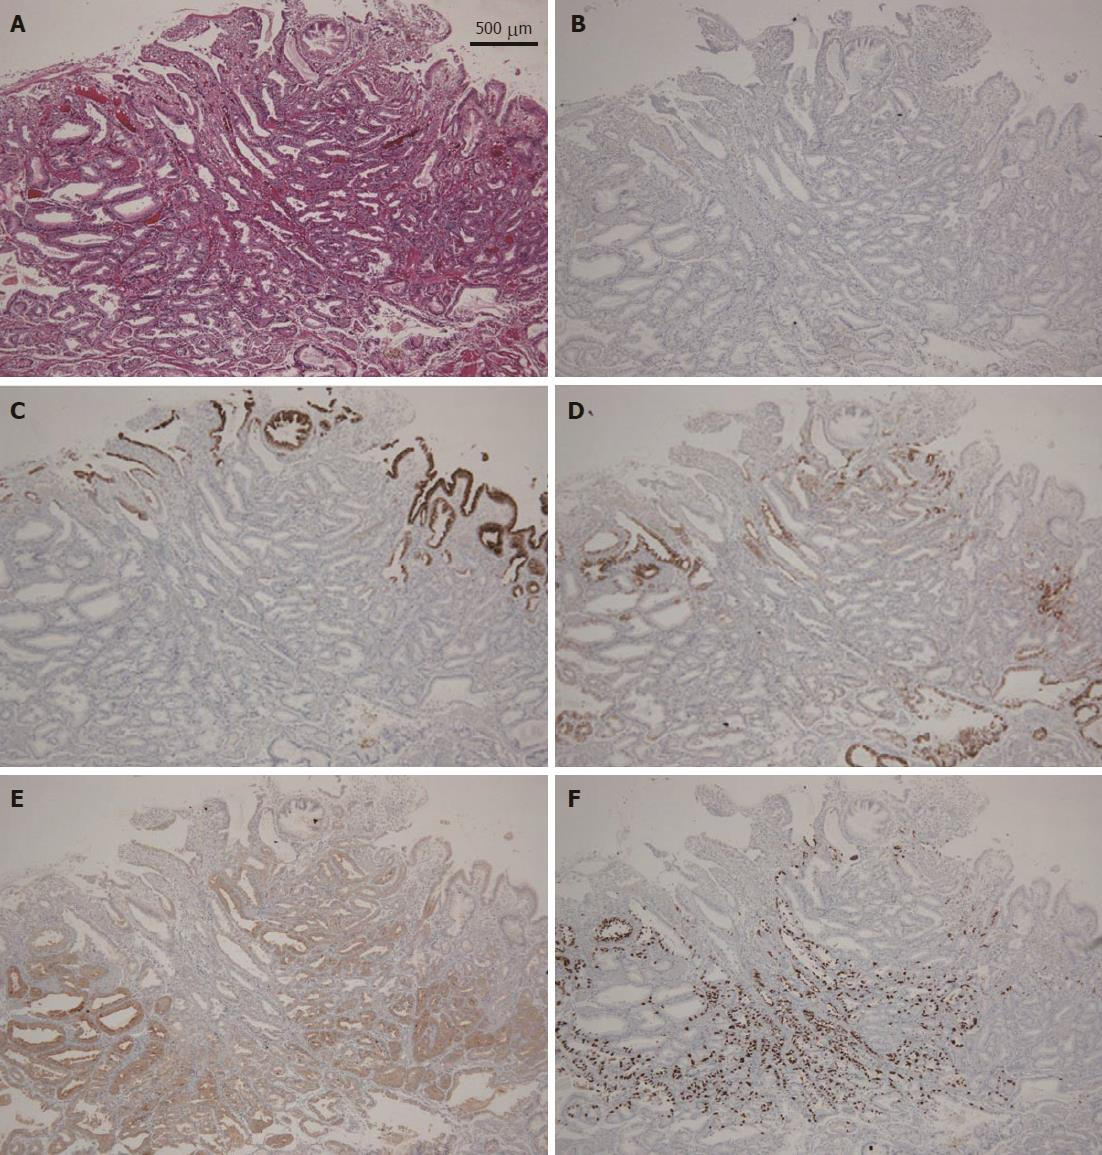 Gastric Adenocarcinoma Of Fundic Gland Type Spreading To